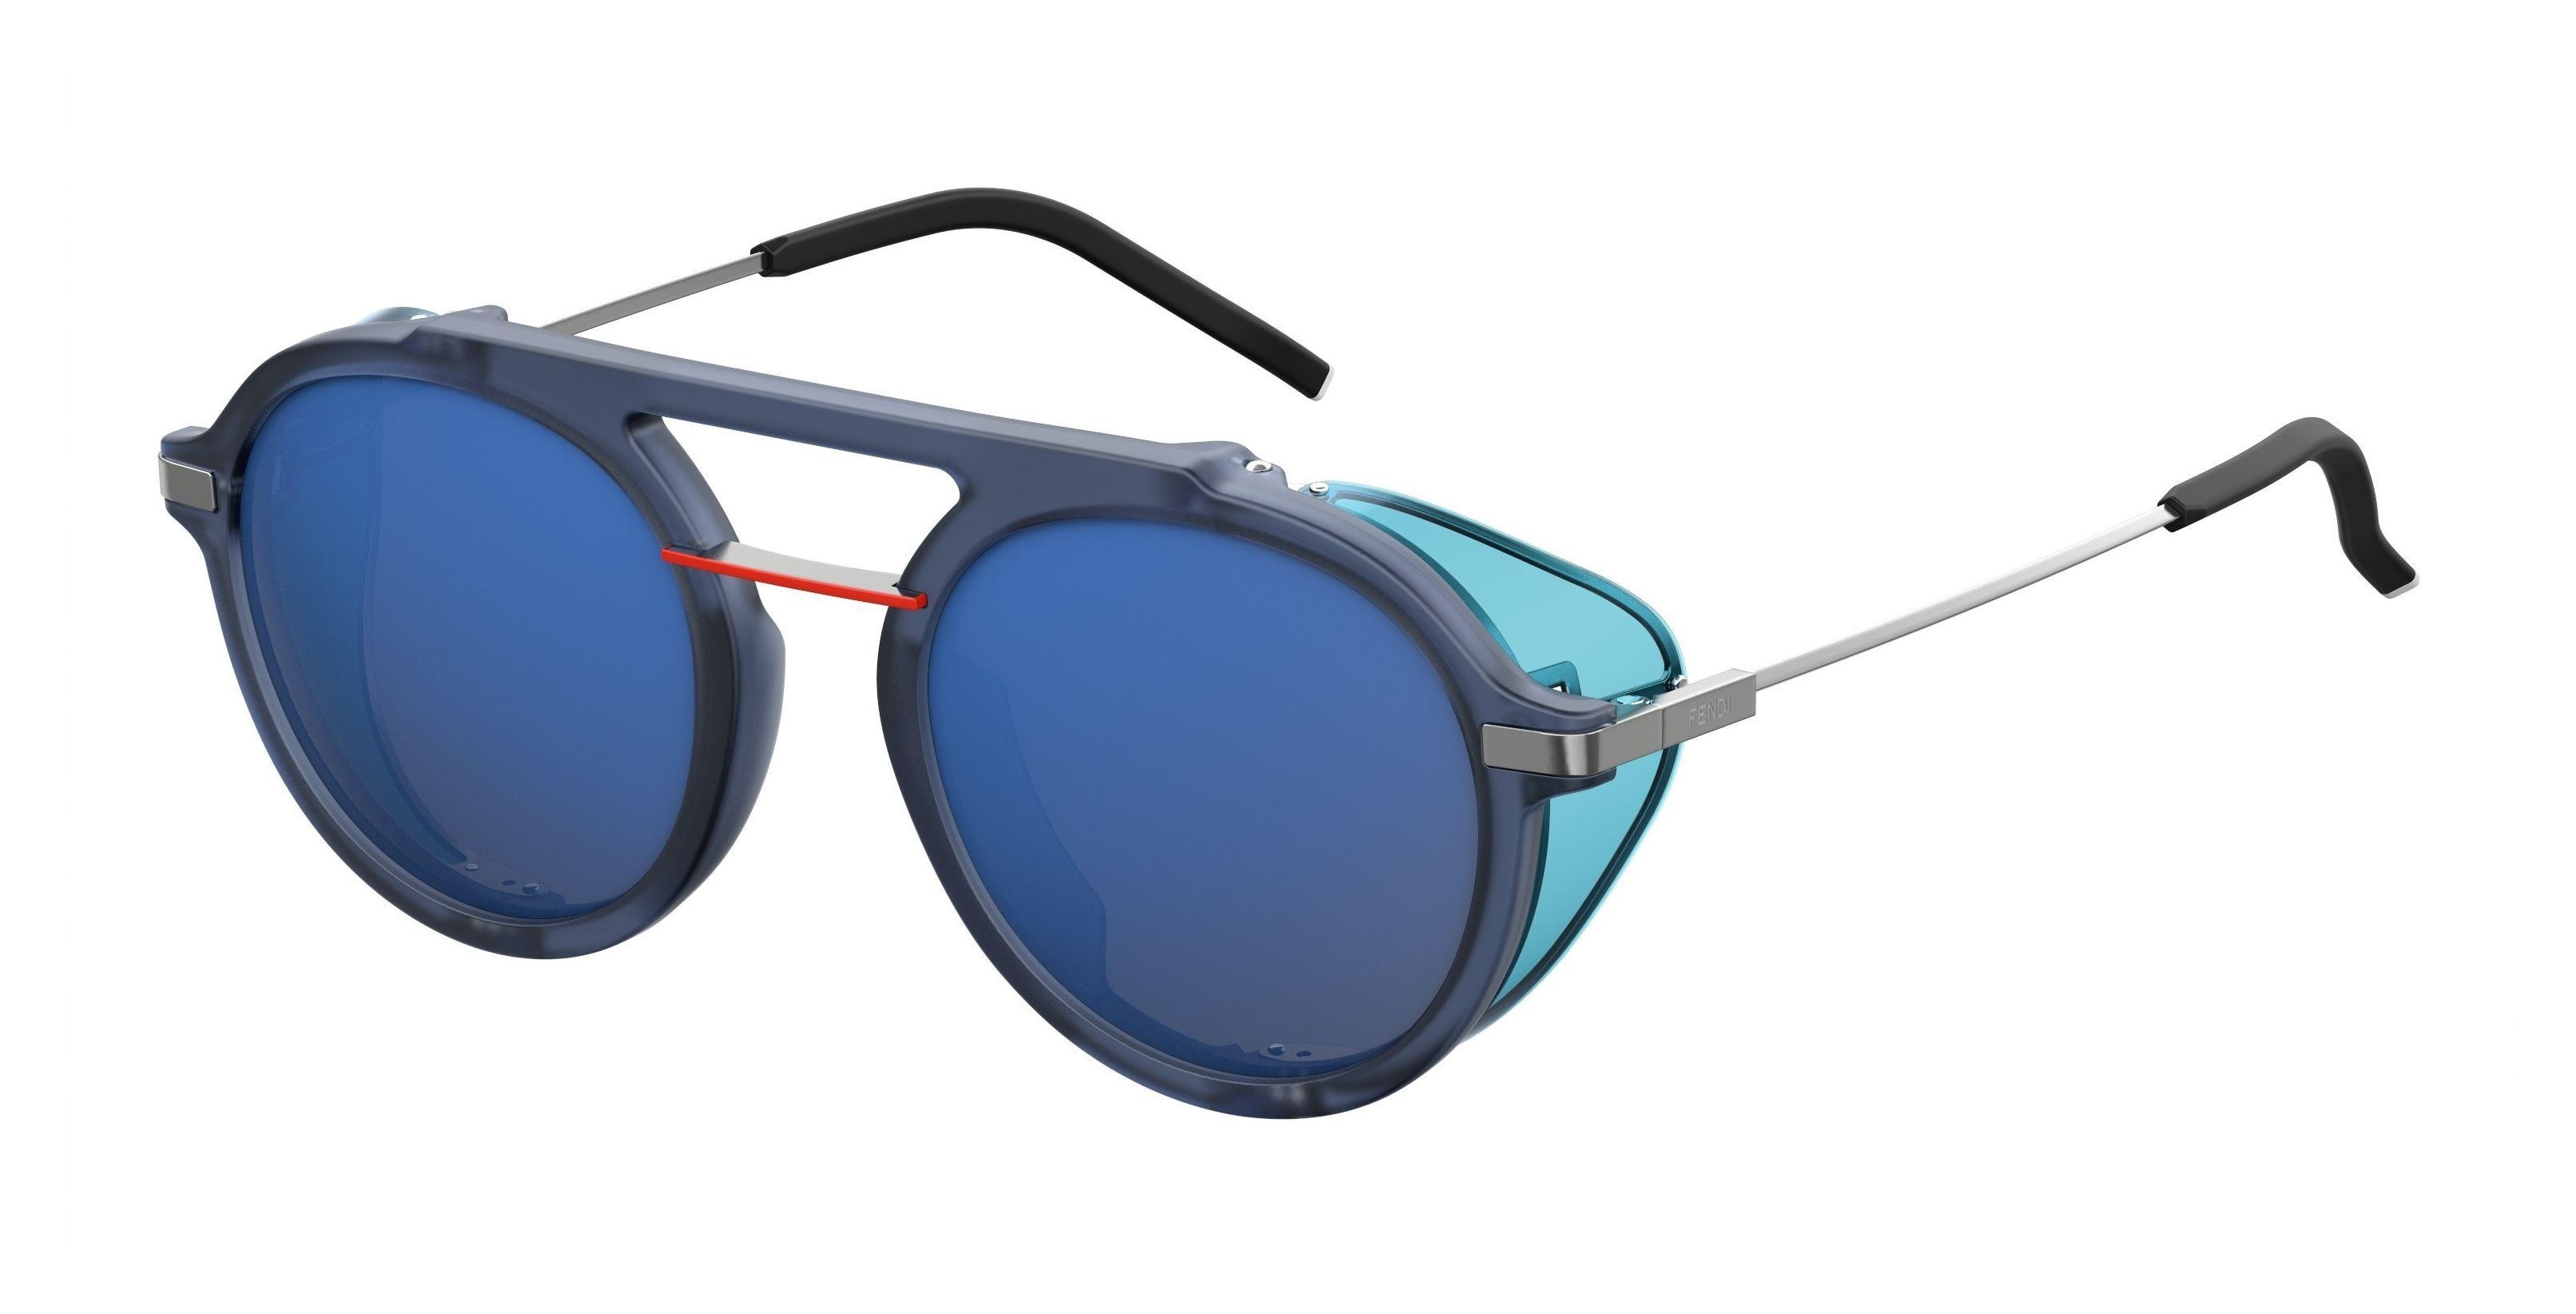 5f2c6be0d04 Fendi - Blue 0012 s Aviator Sunglasses for Men - Lyst. View fullscreen